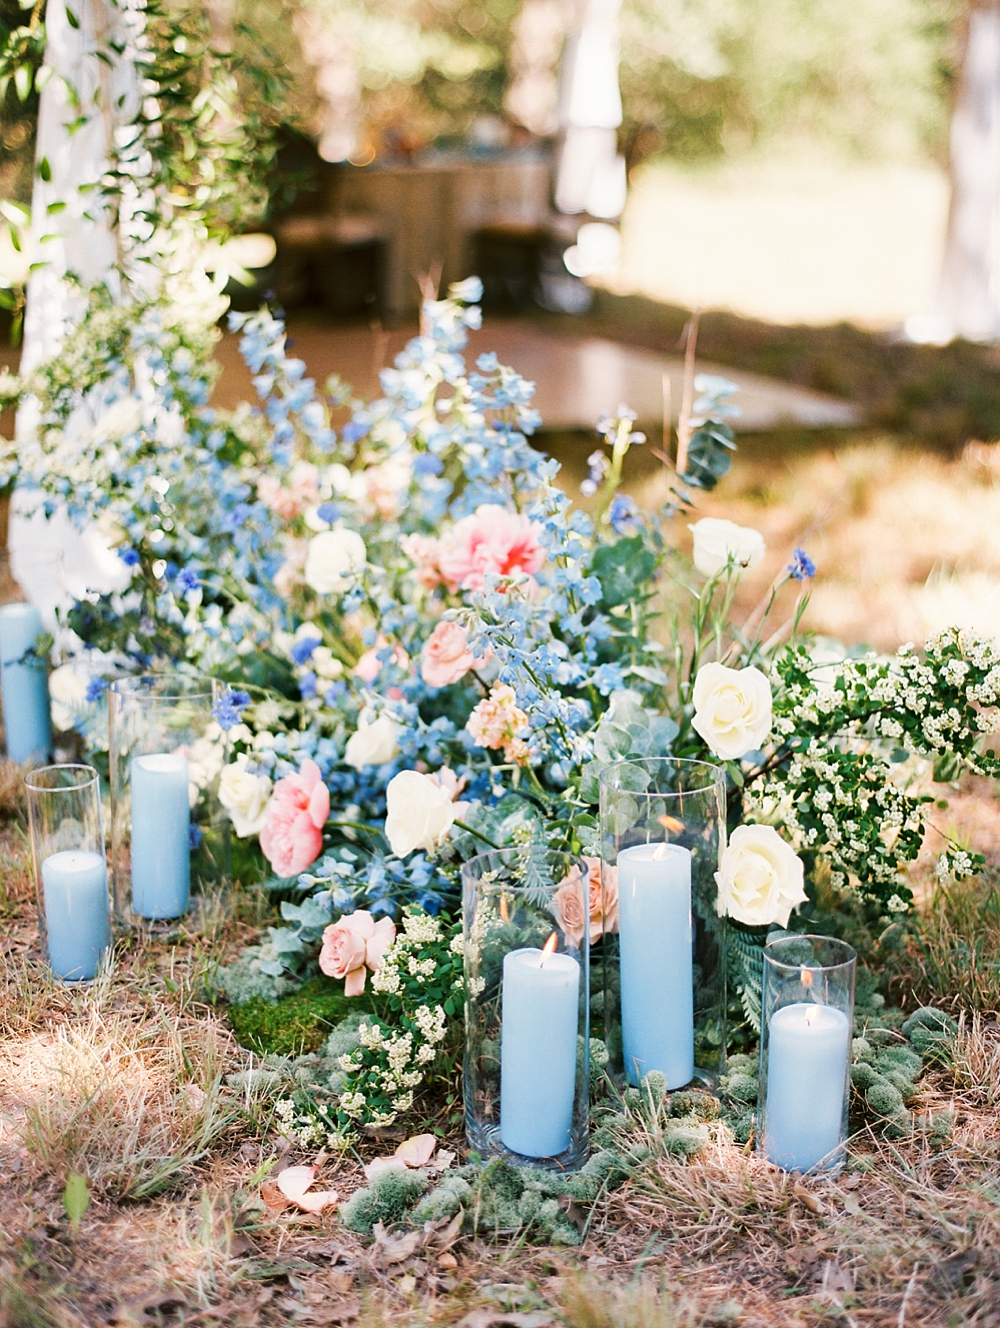 Kristin-La-Voie-Photography-Austin-Wedding-Photographer-the-grand-lady-40